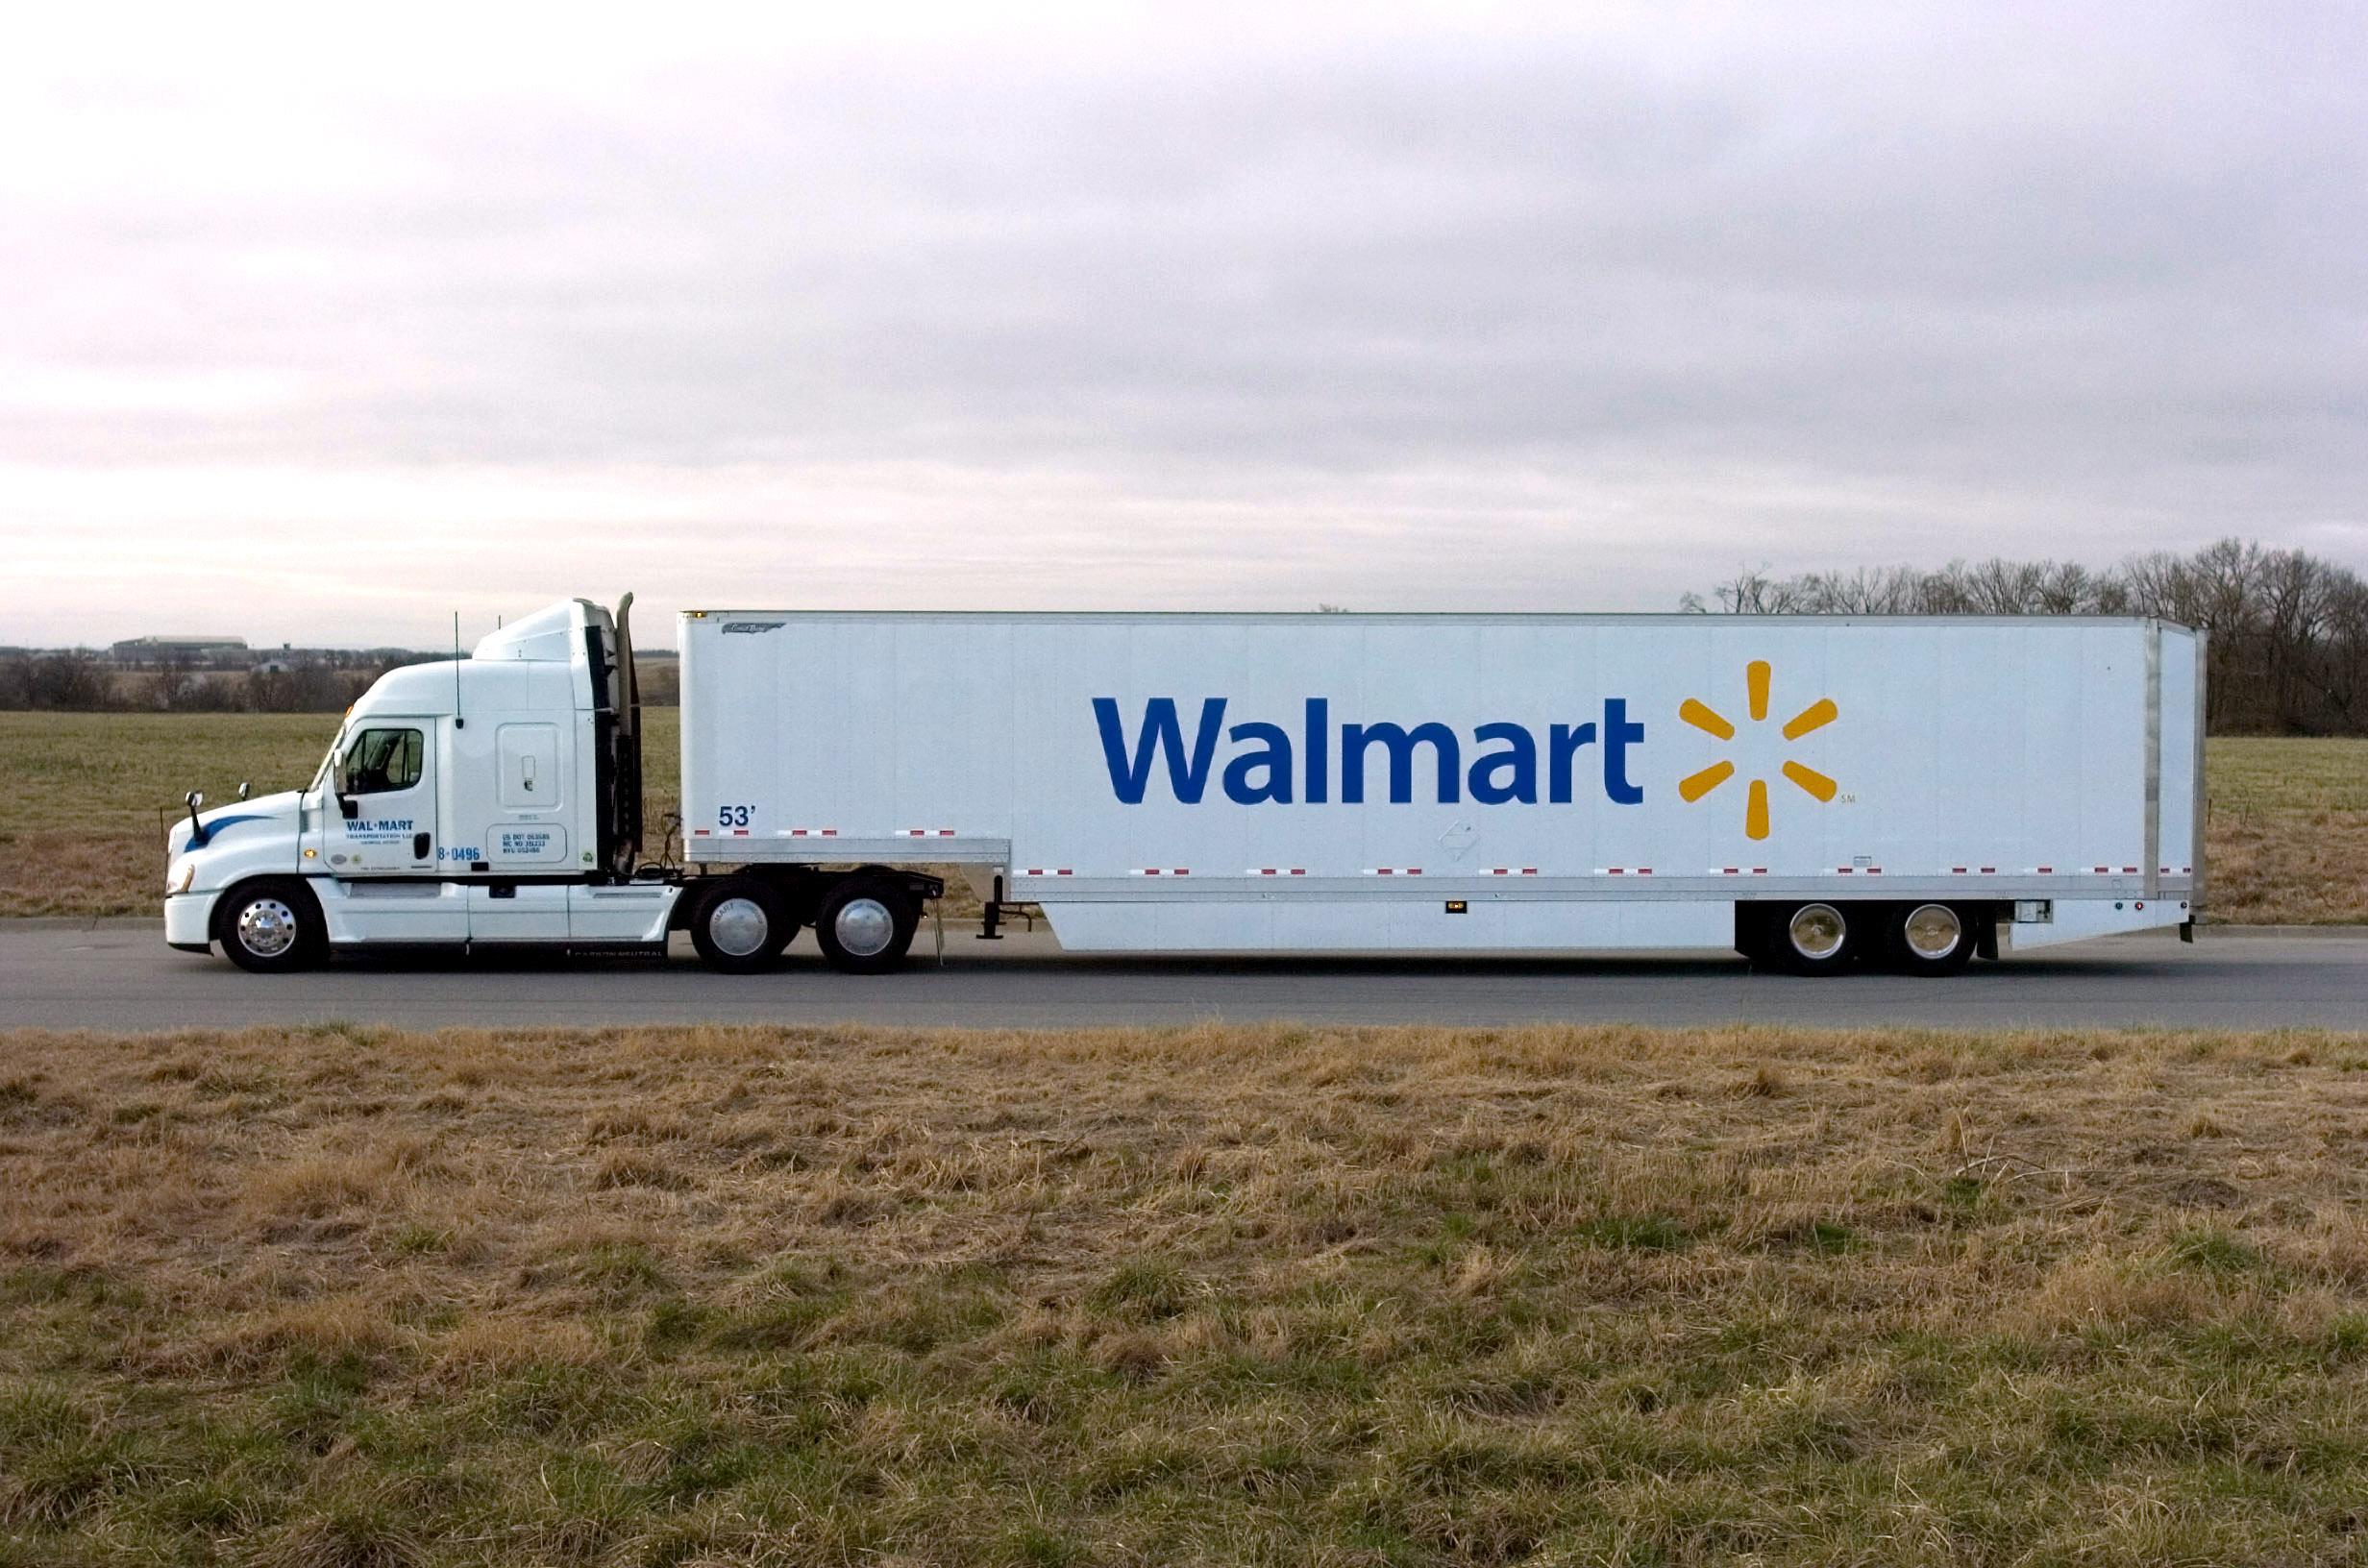 A Walmart tractor trailer